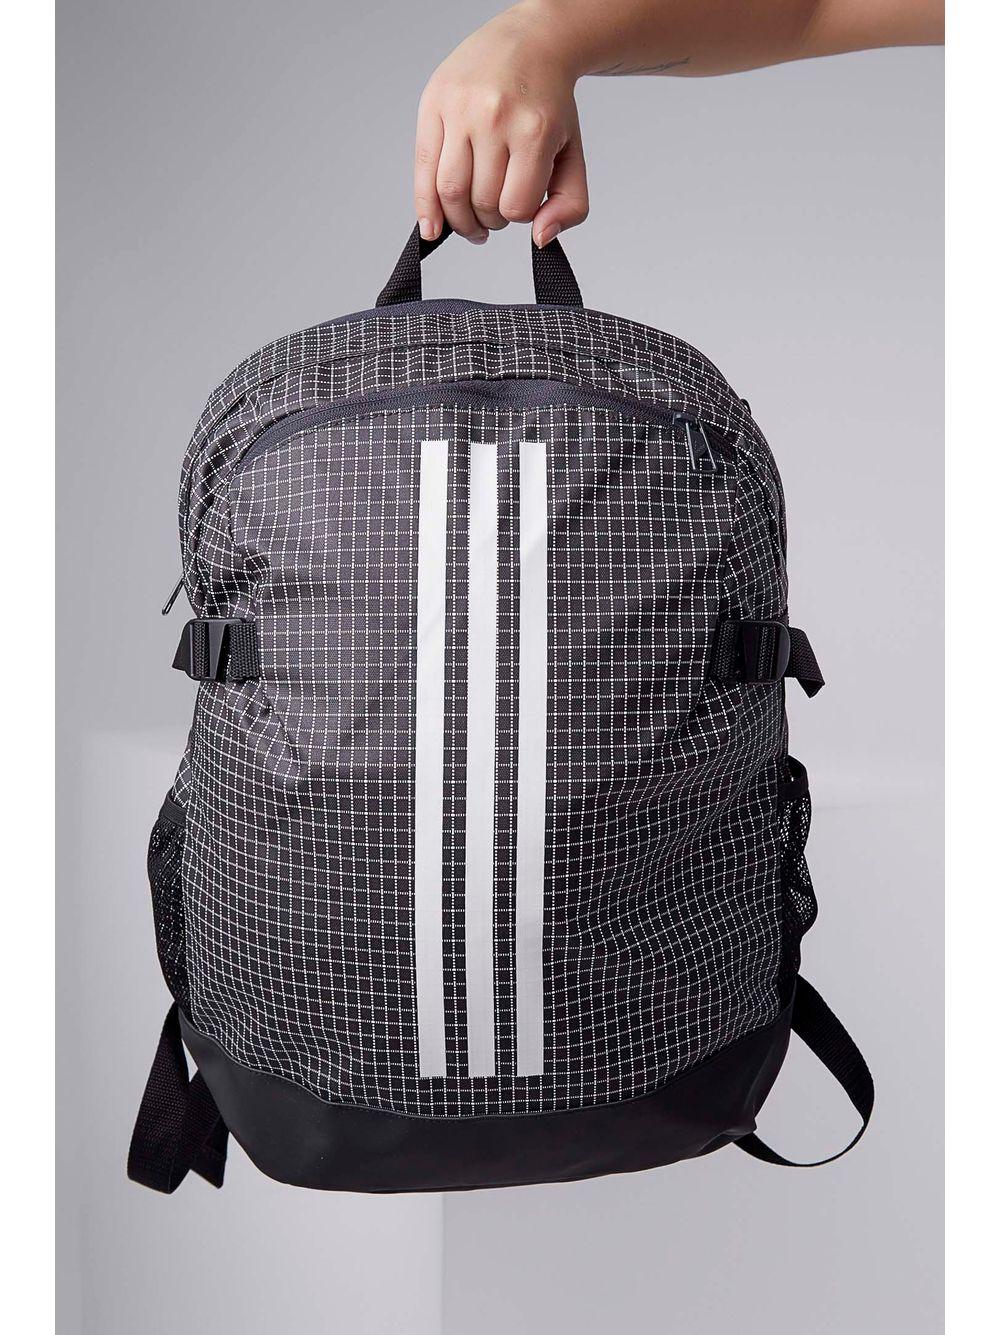 Mochila Adidas Power Pb Fabric Preto - pittol fdff1b79eeb9f